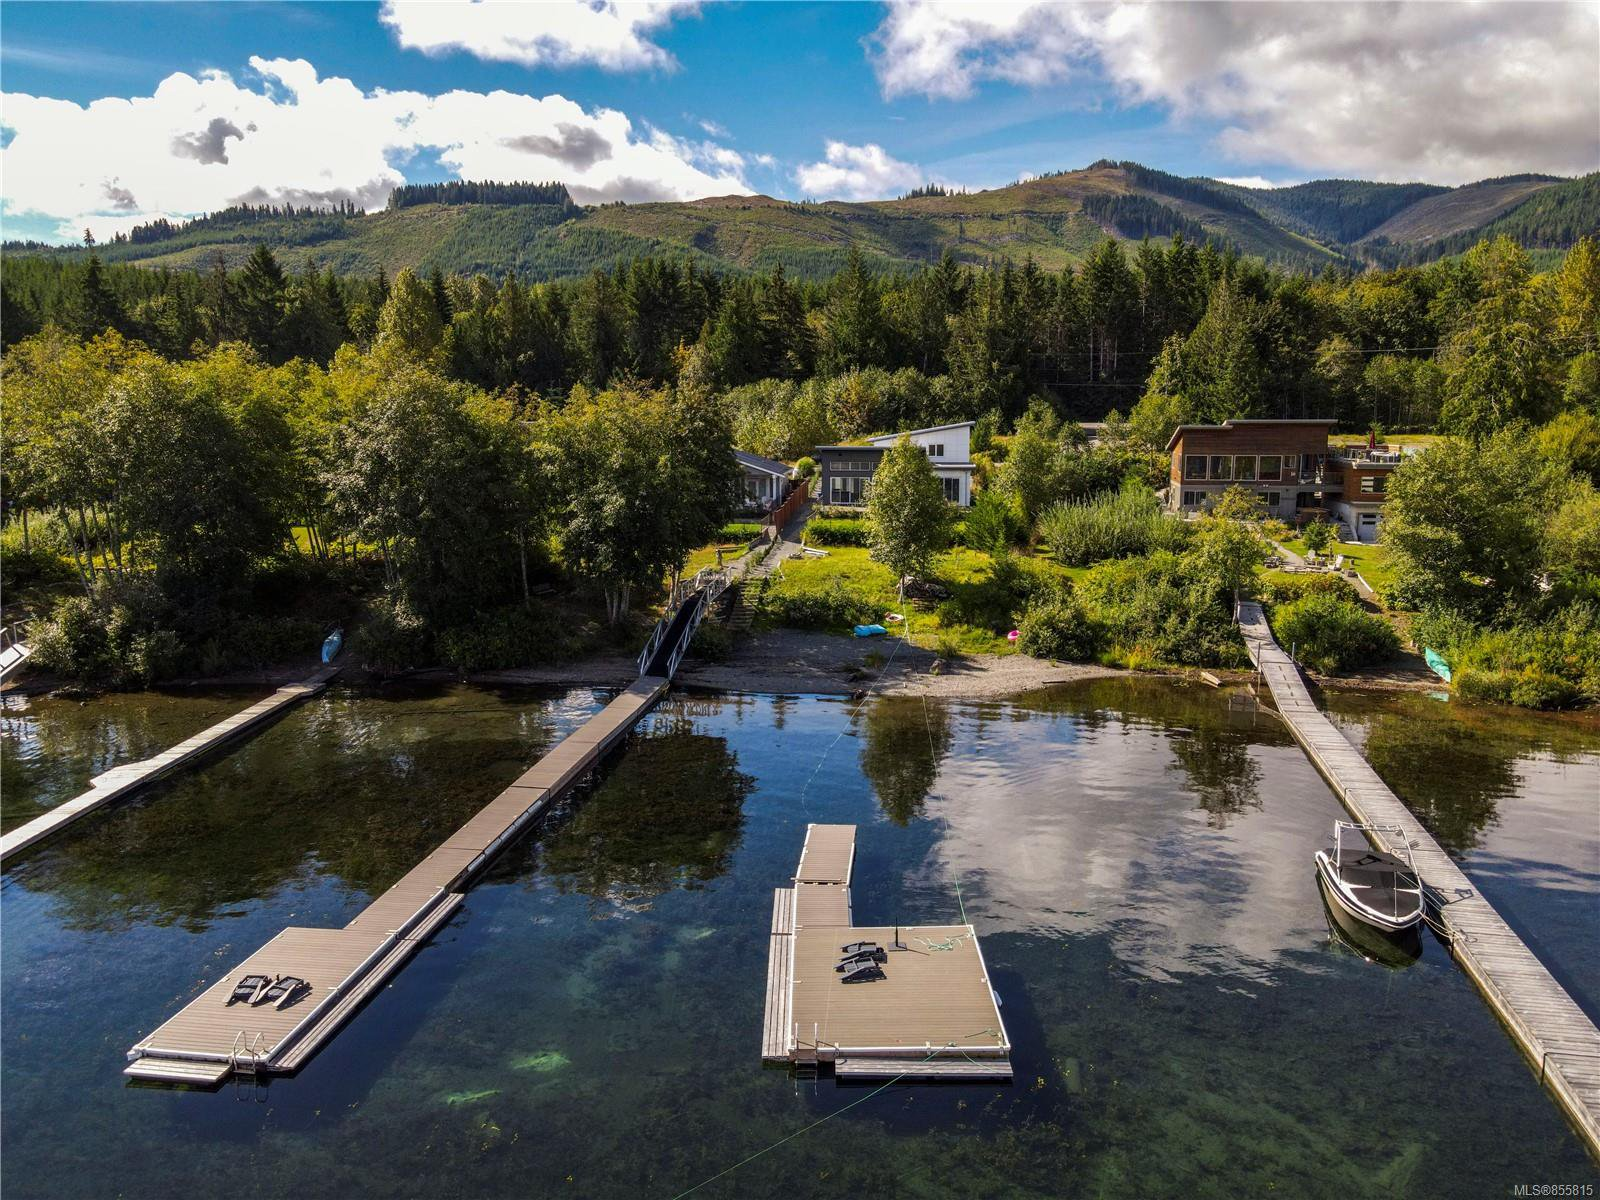 Main Photo: 9887 Stin-Qua Rd in : Du Honeymoon Bay House for sale (Duncan)  : MLS®# 855815